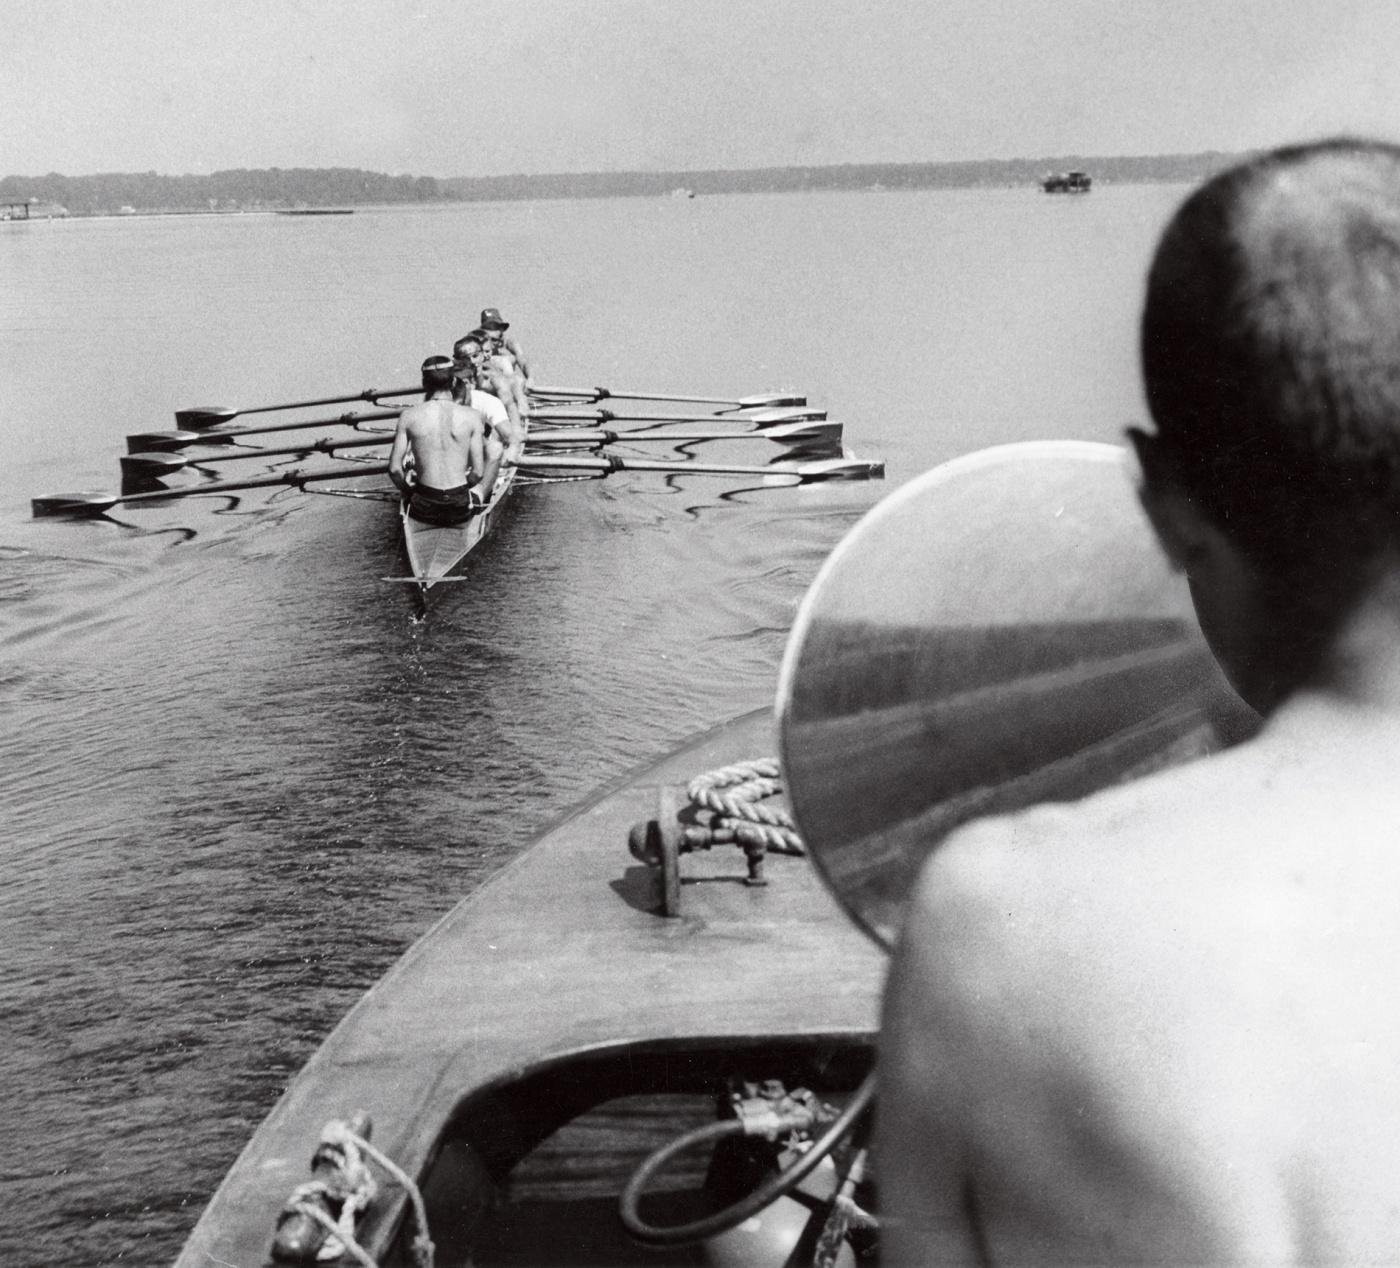 1960 crew training, coach's view